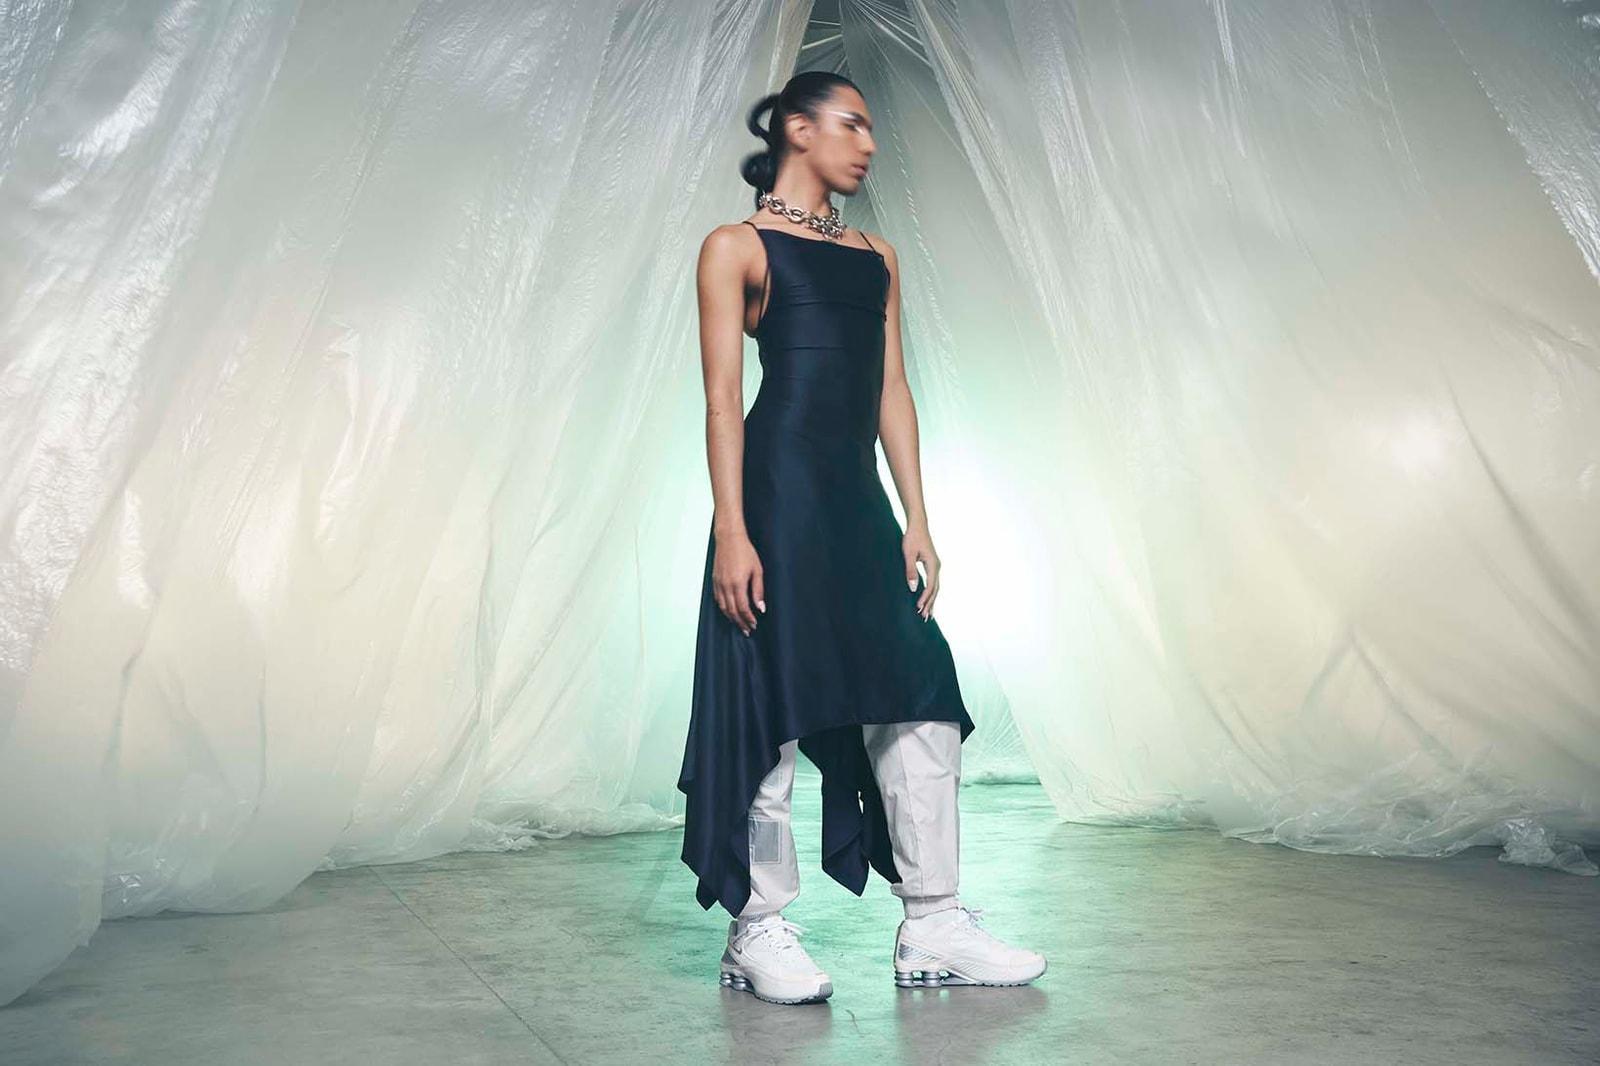 Nike Shox Profile 'Provocactive' Artists New Campaign Charm Mone Berlin